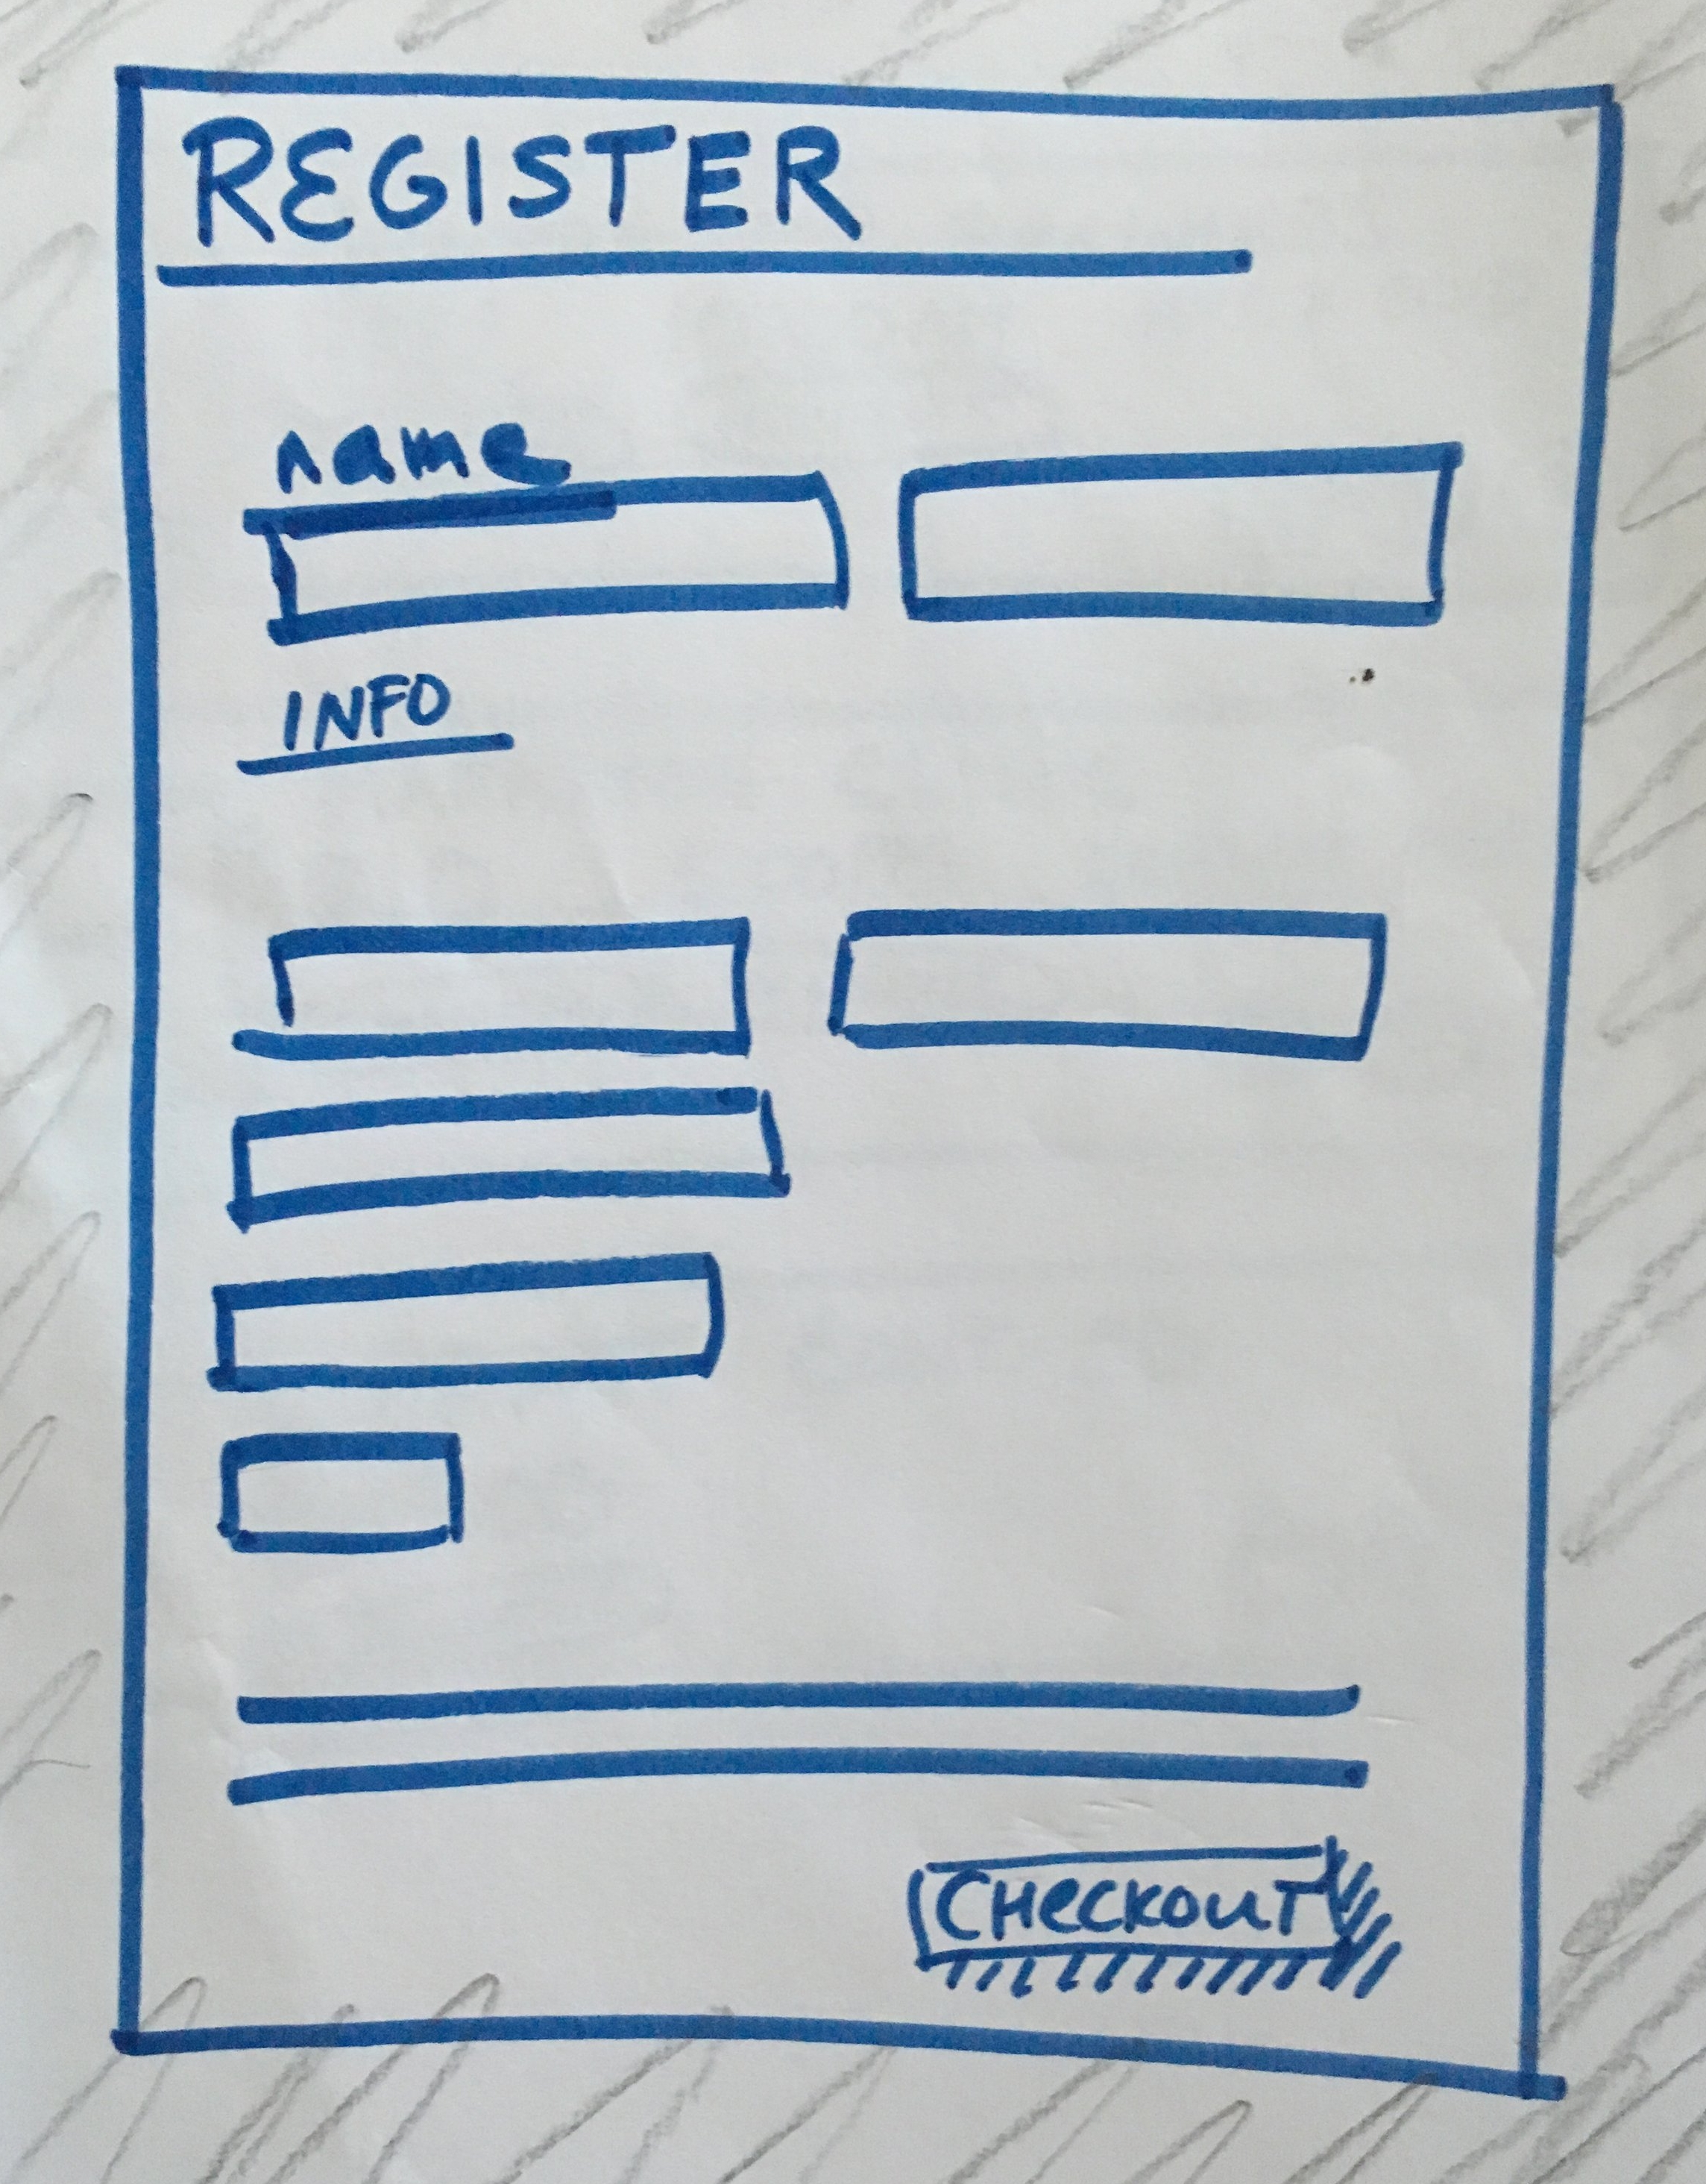 Registration Page Artifact